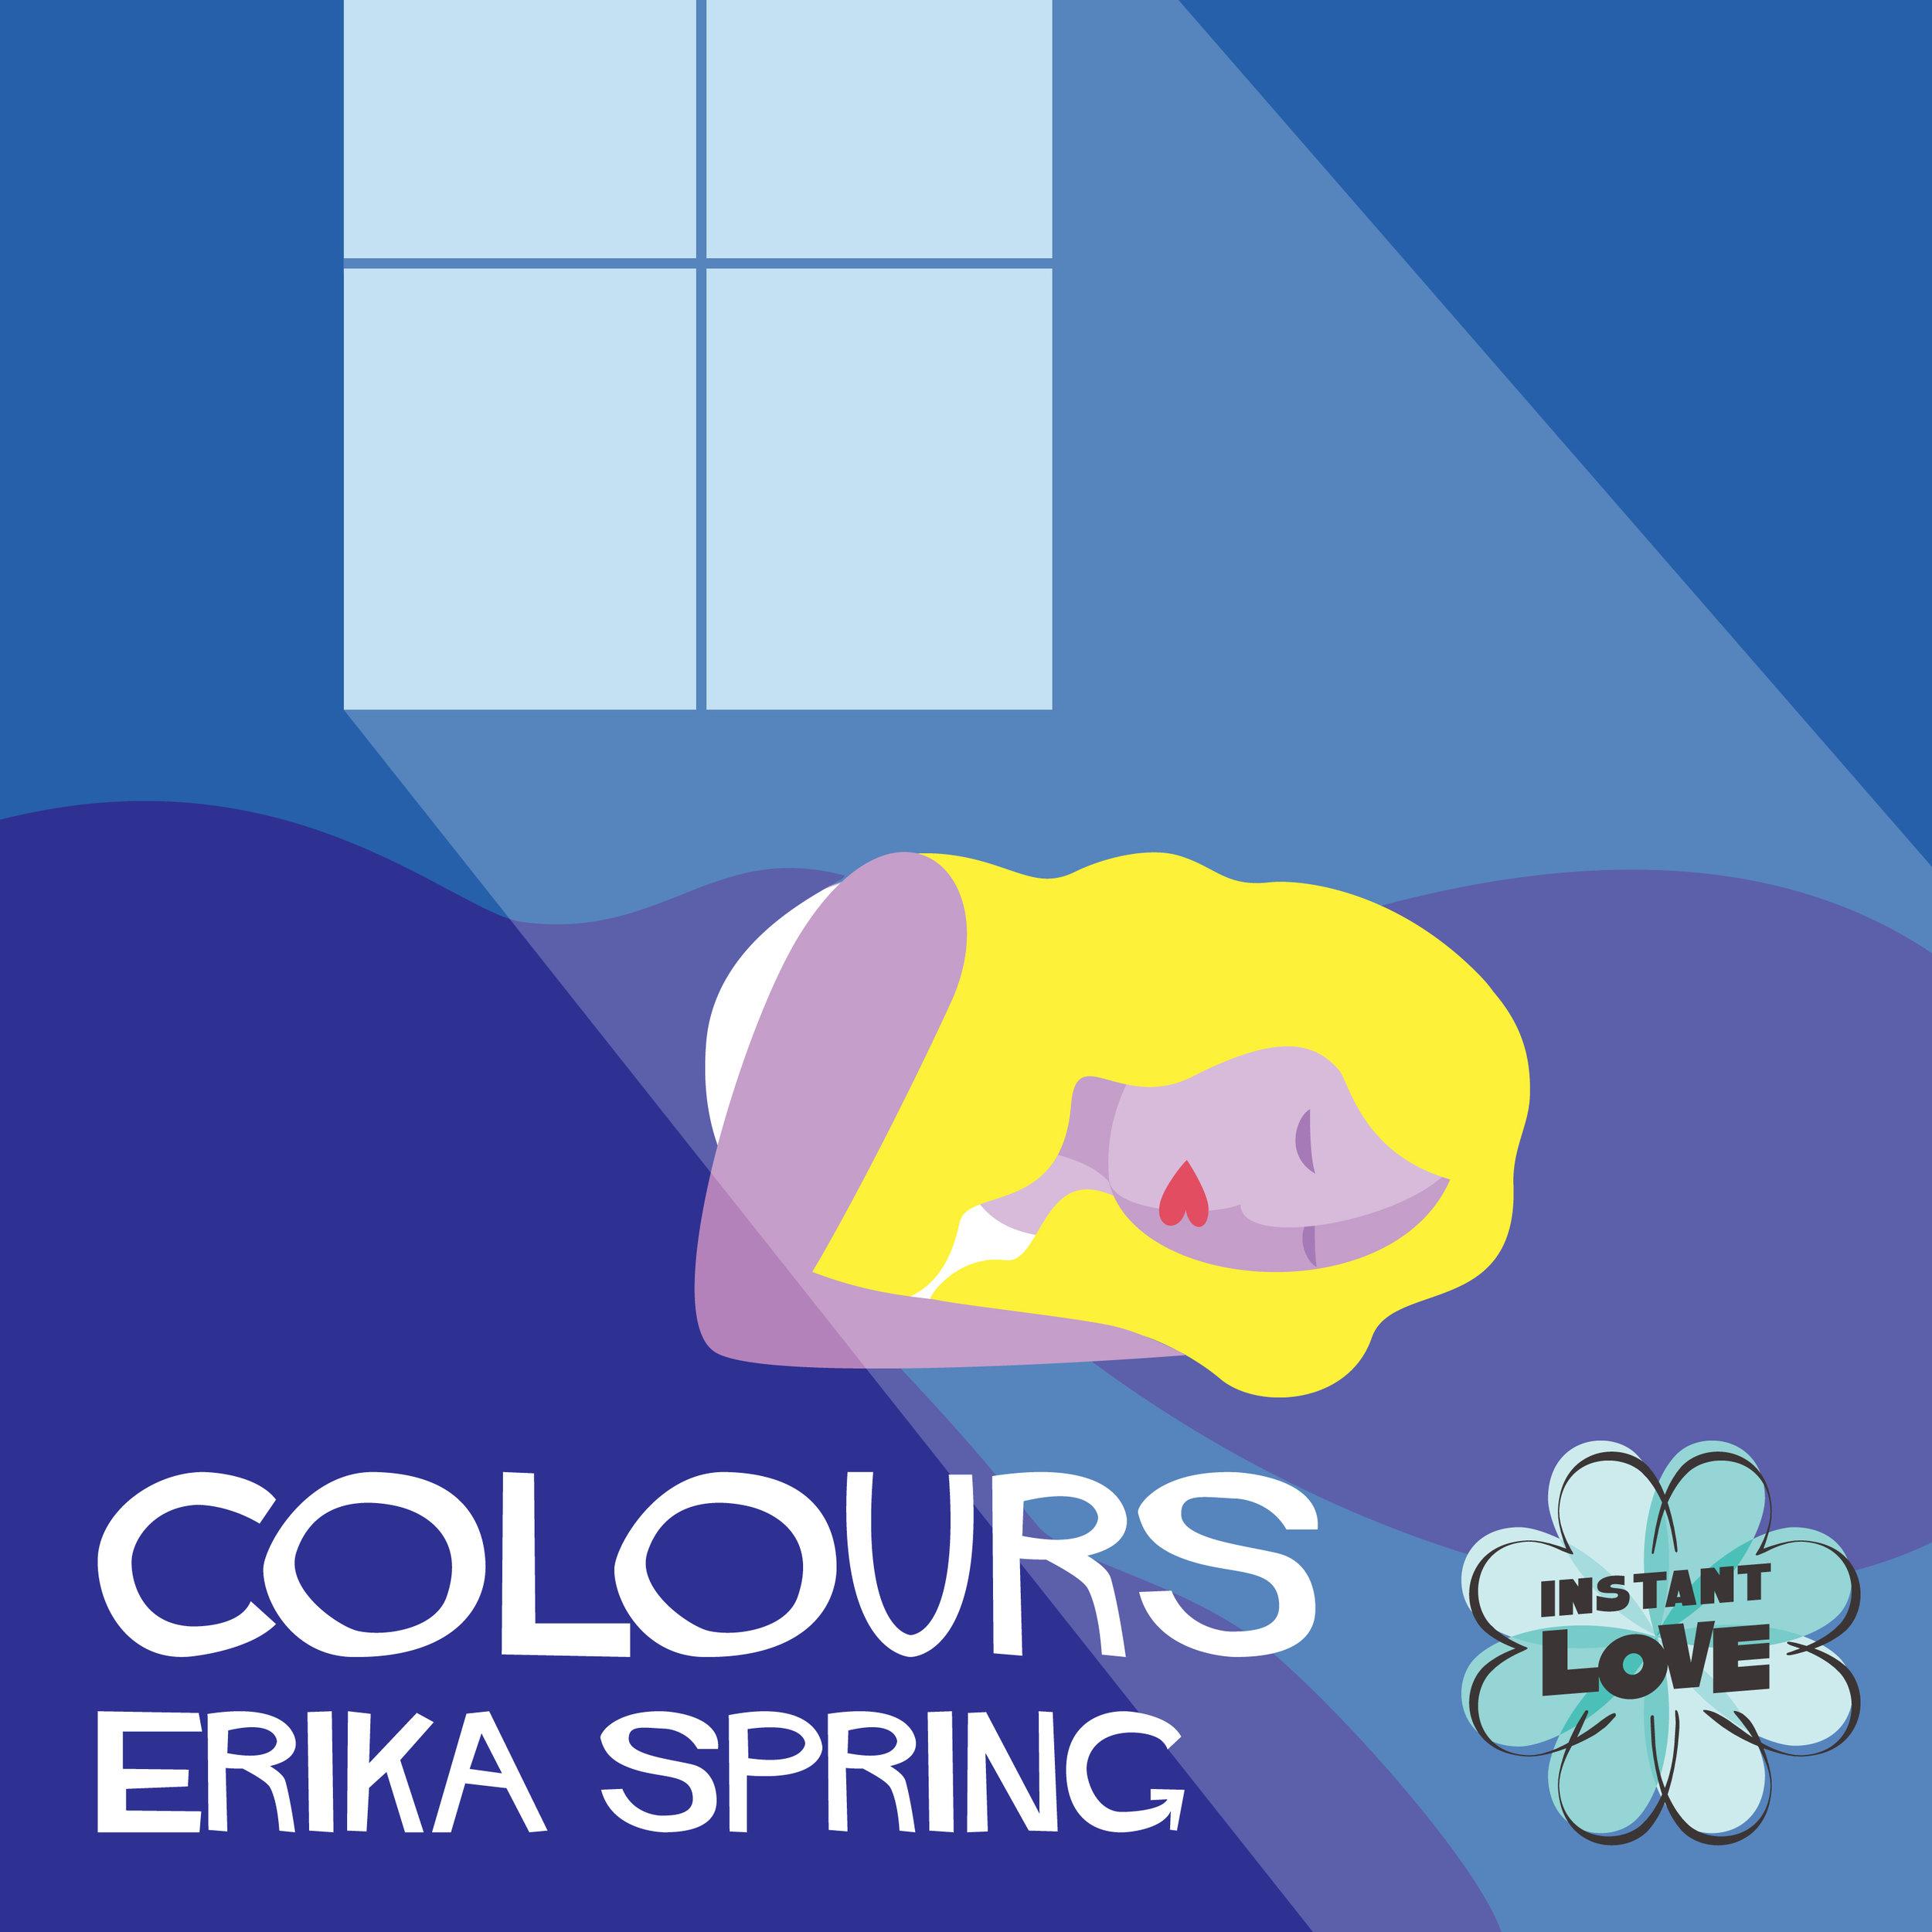 10-6_Colours_Erika Spring.jpg